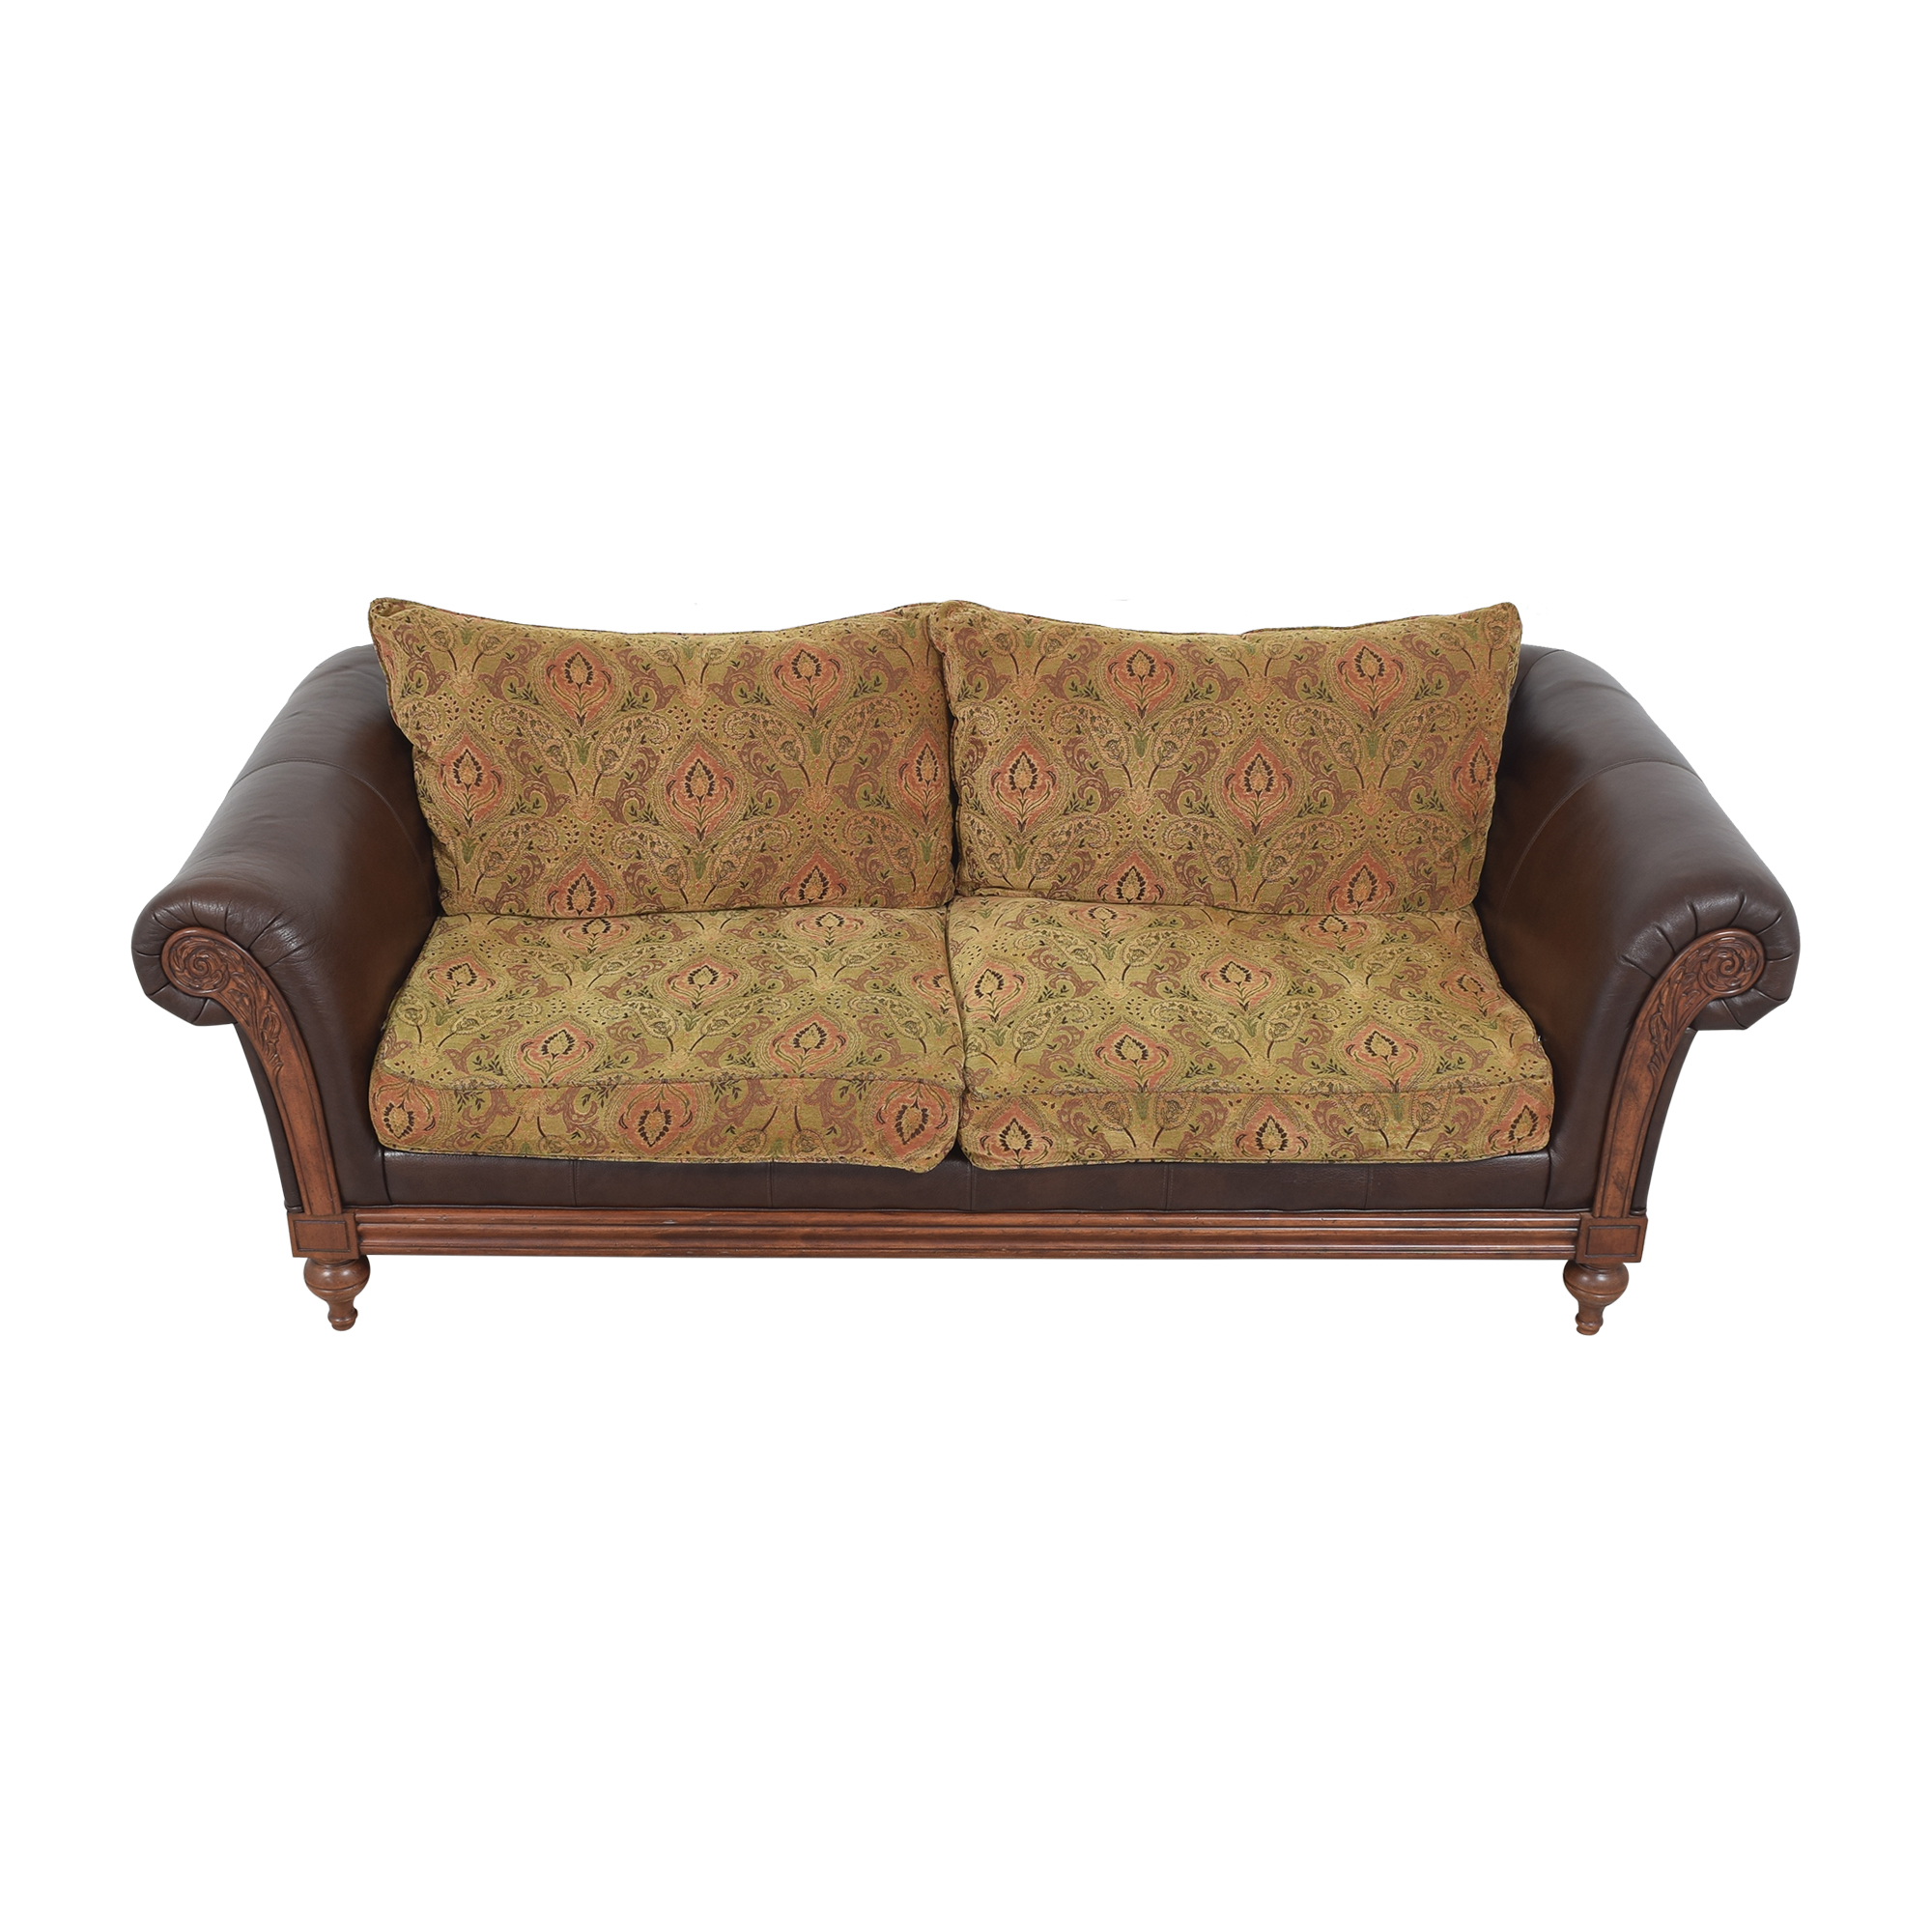 Ethan Allen Pratt Sofa / Classic Sofas